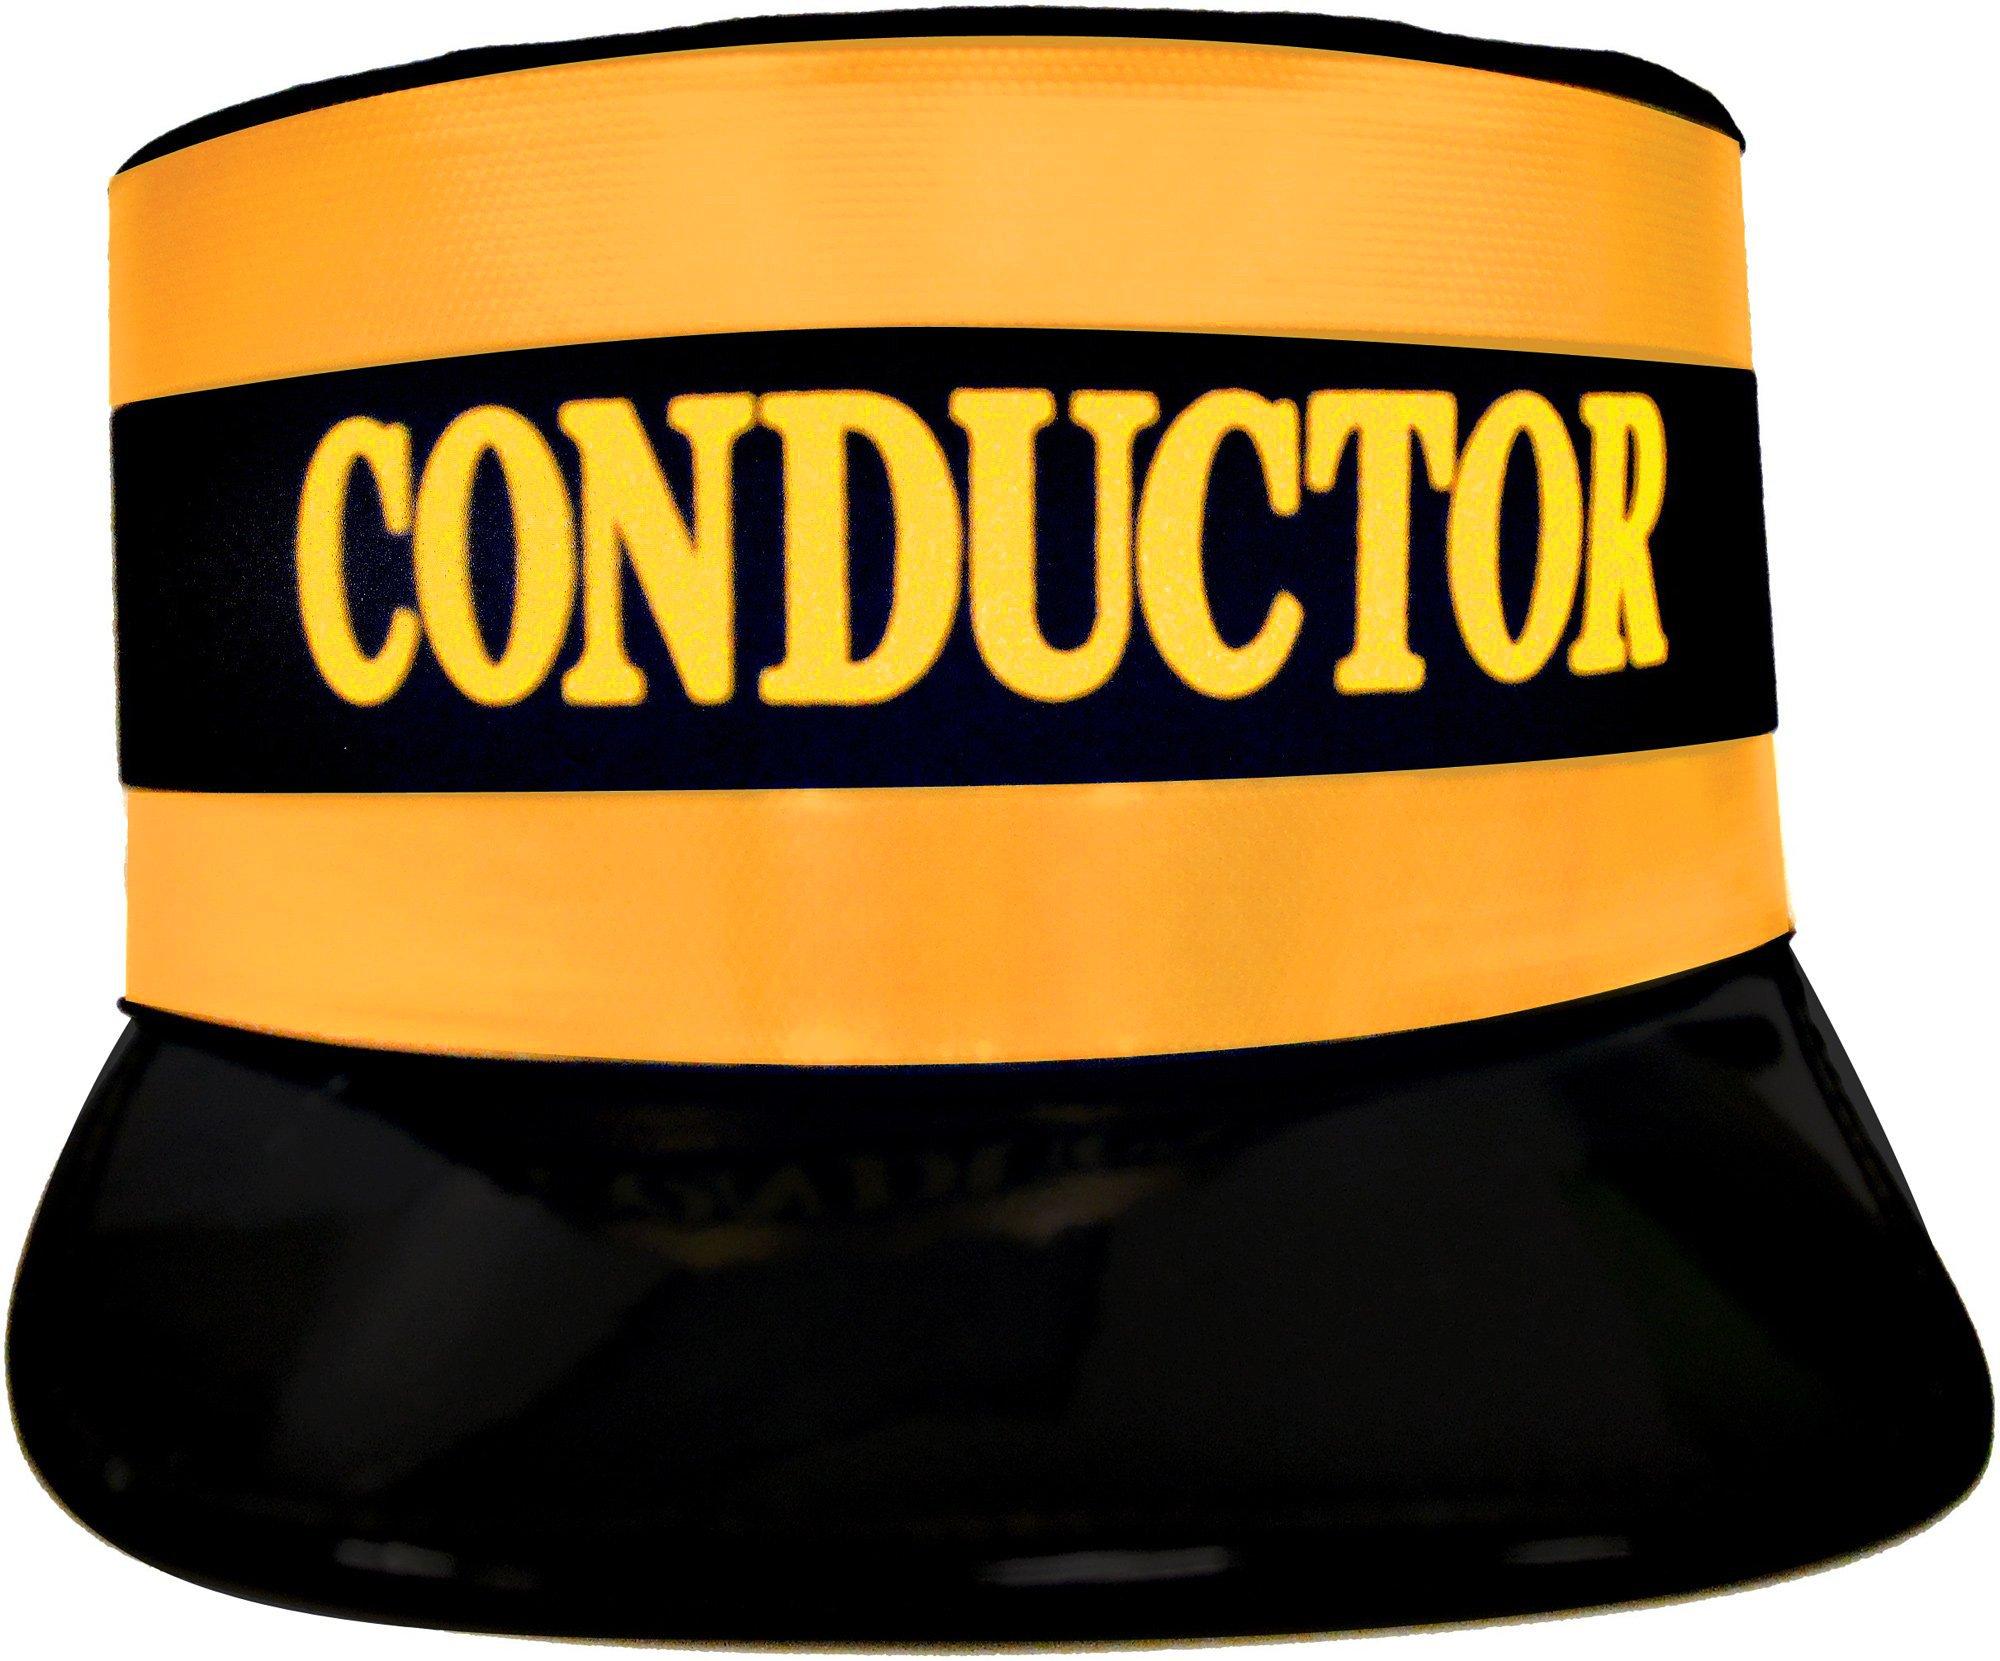 Conductor Hat Economy.